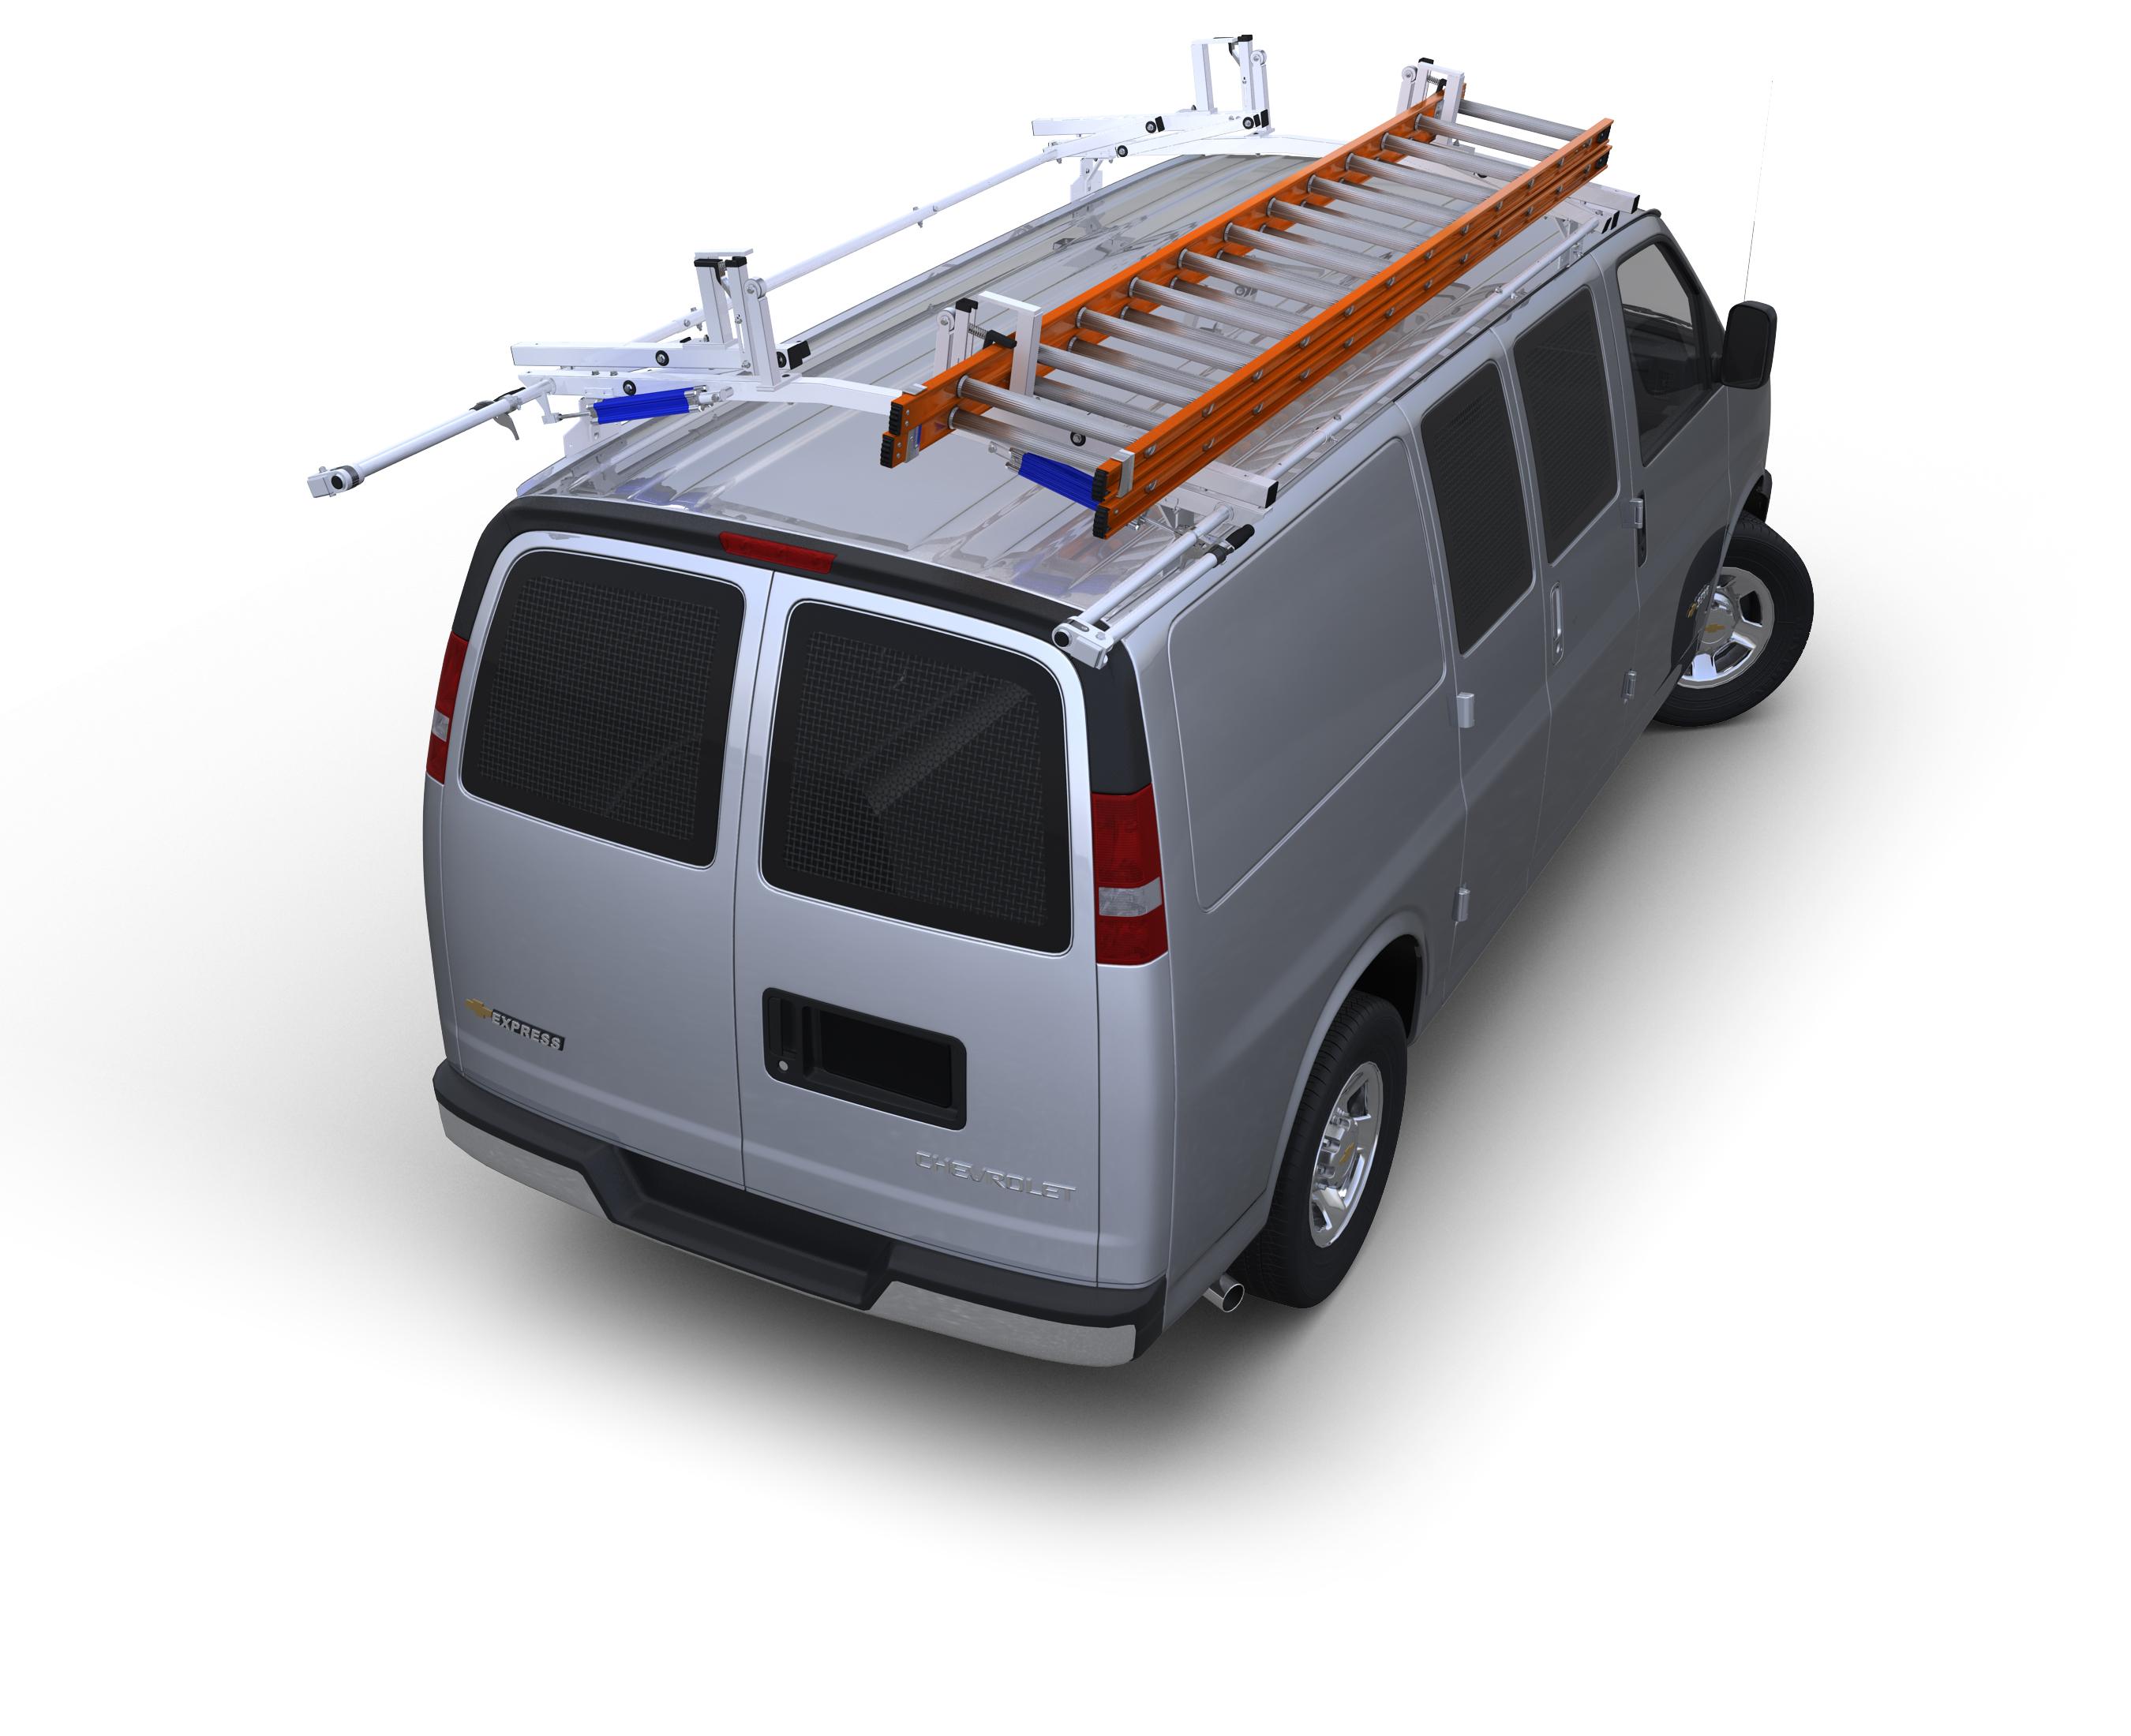 Mini Van Ladder Rack, Bowed Cross Supports